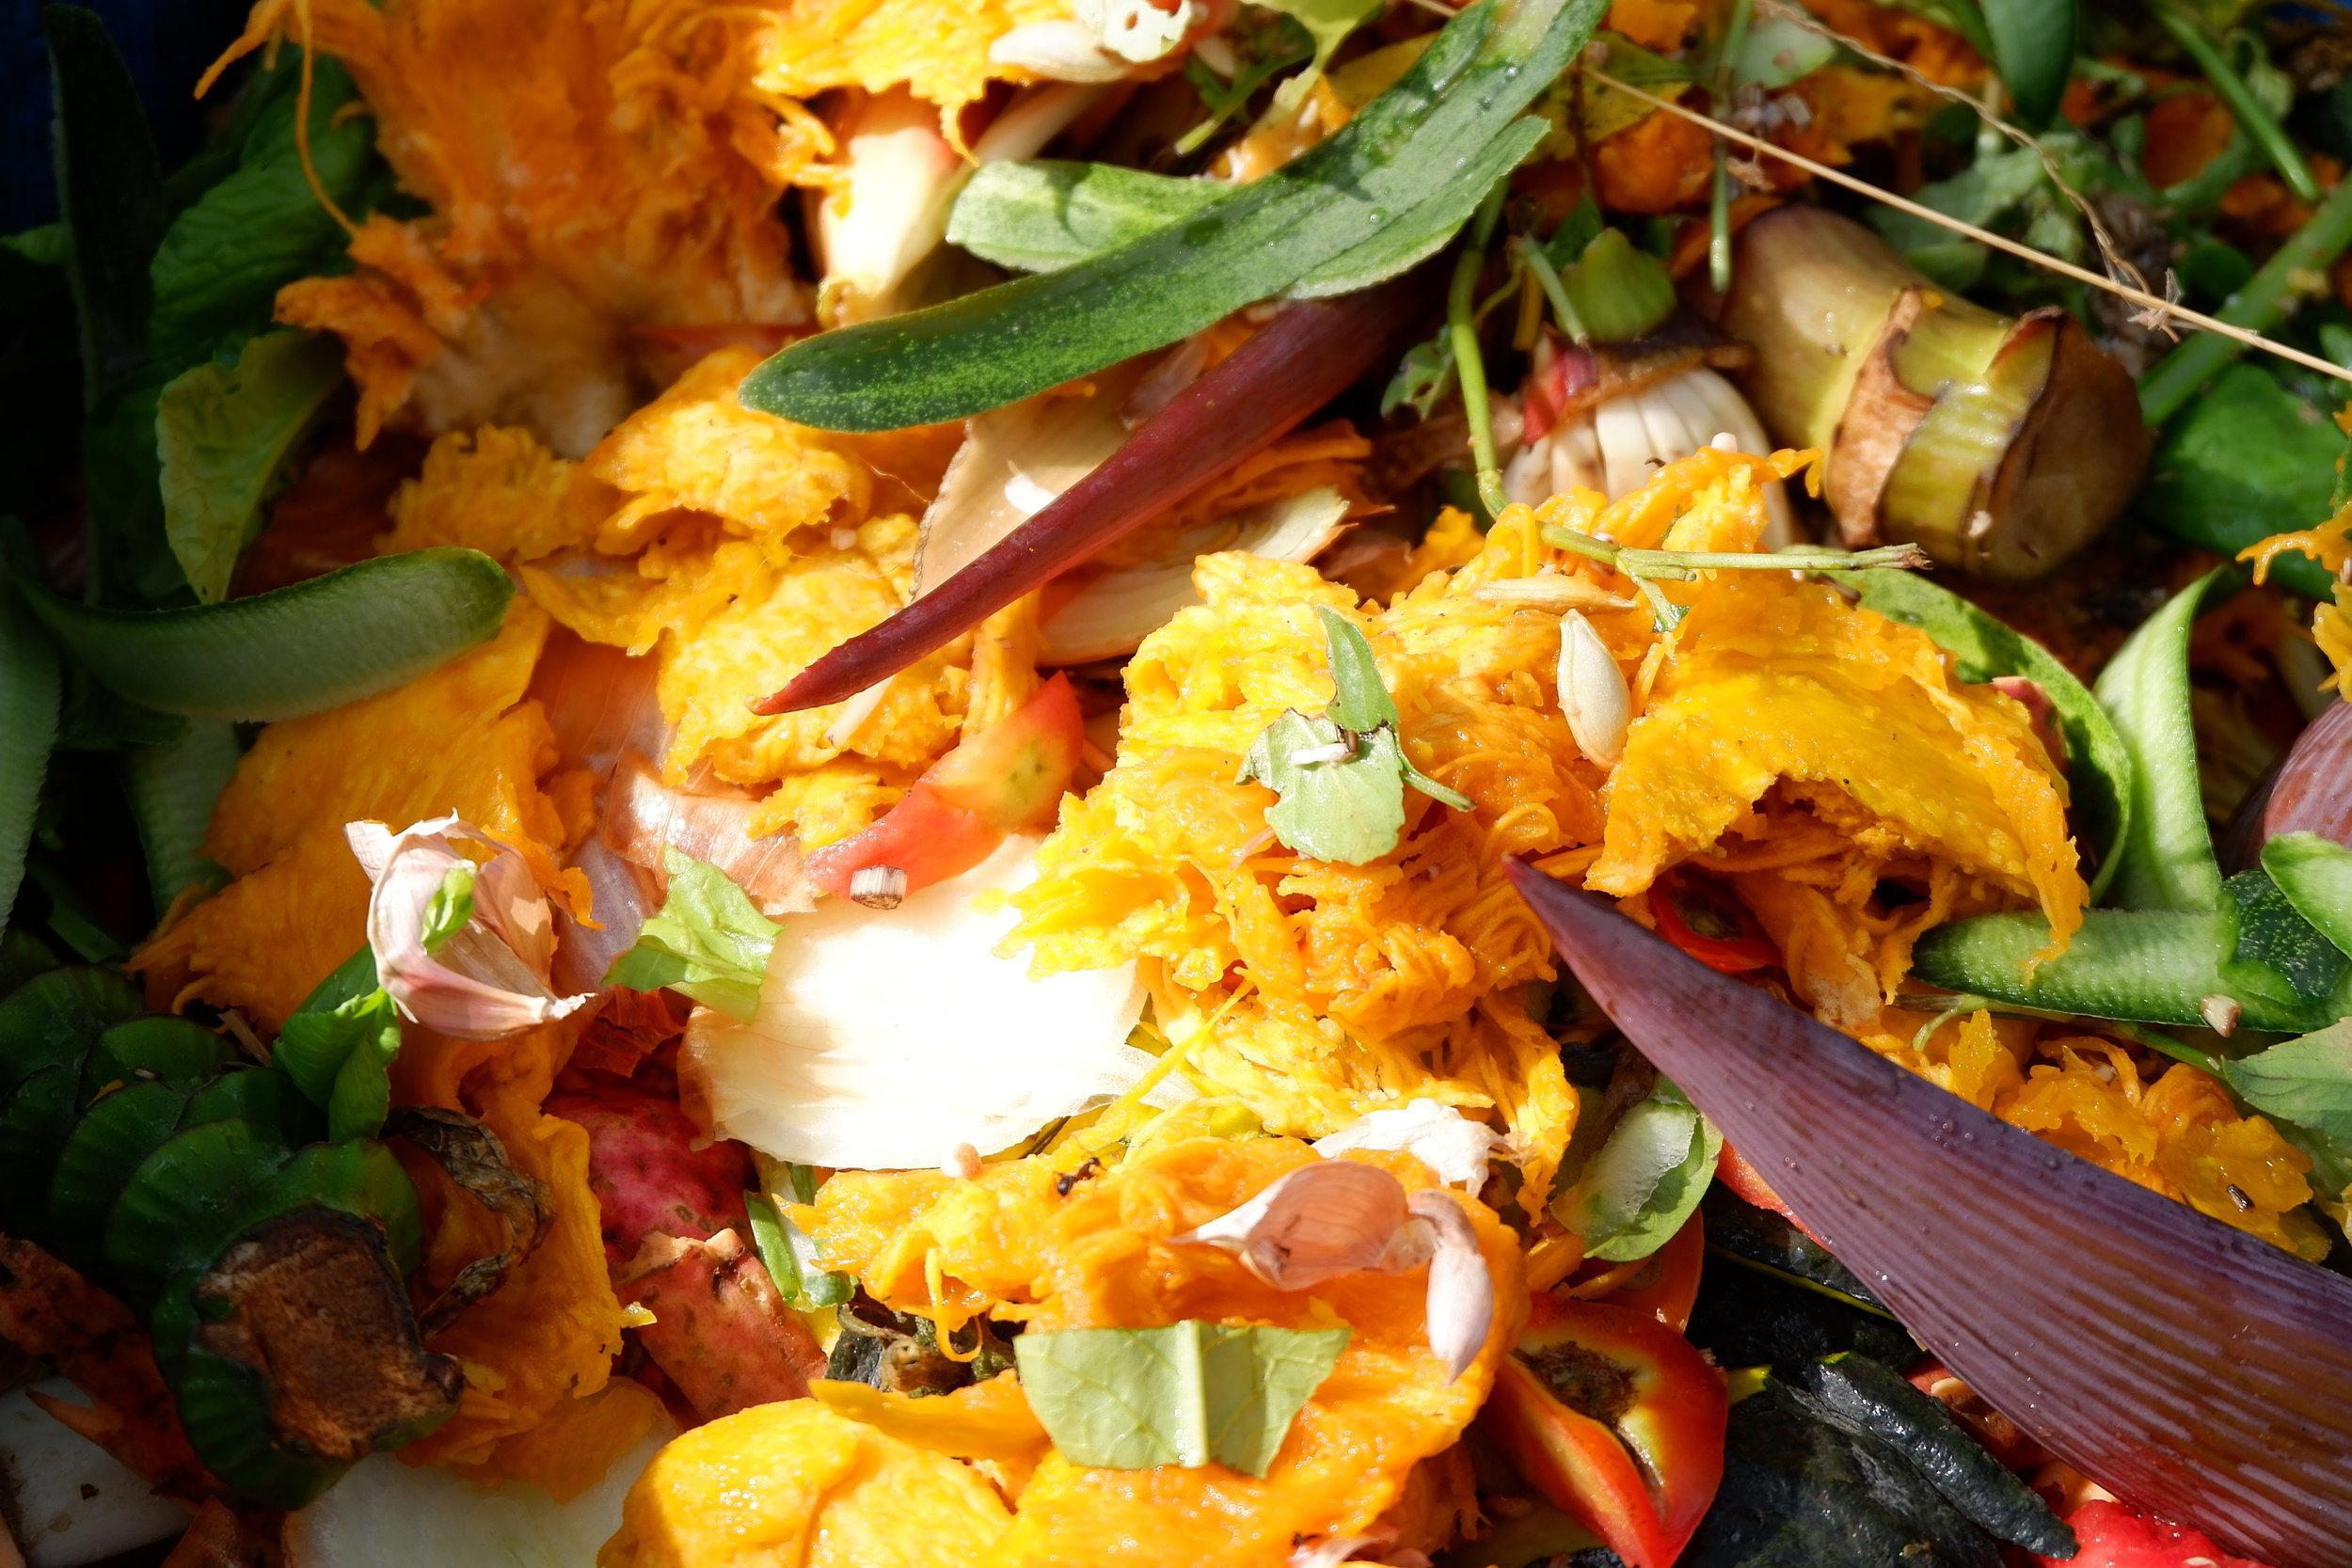 Beautiful mix of vegetable scraps.